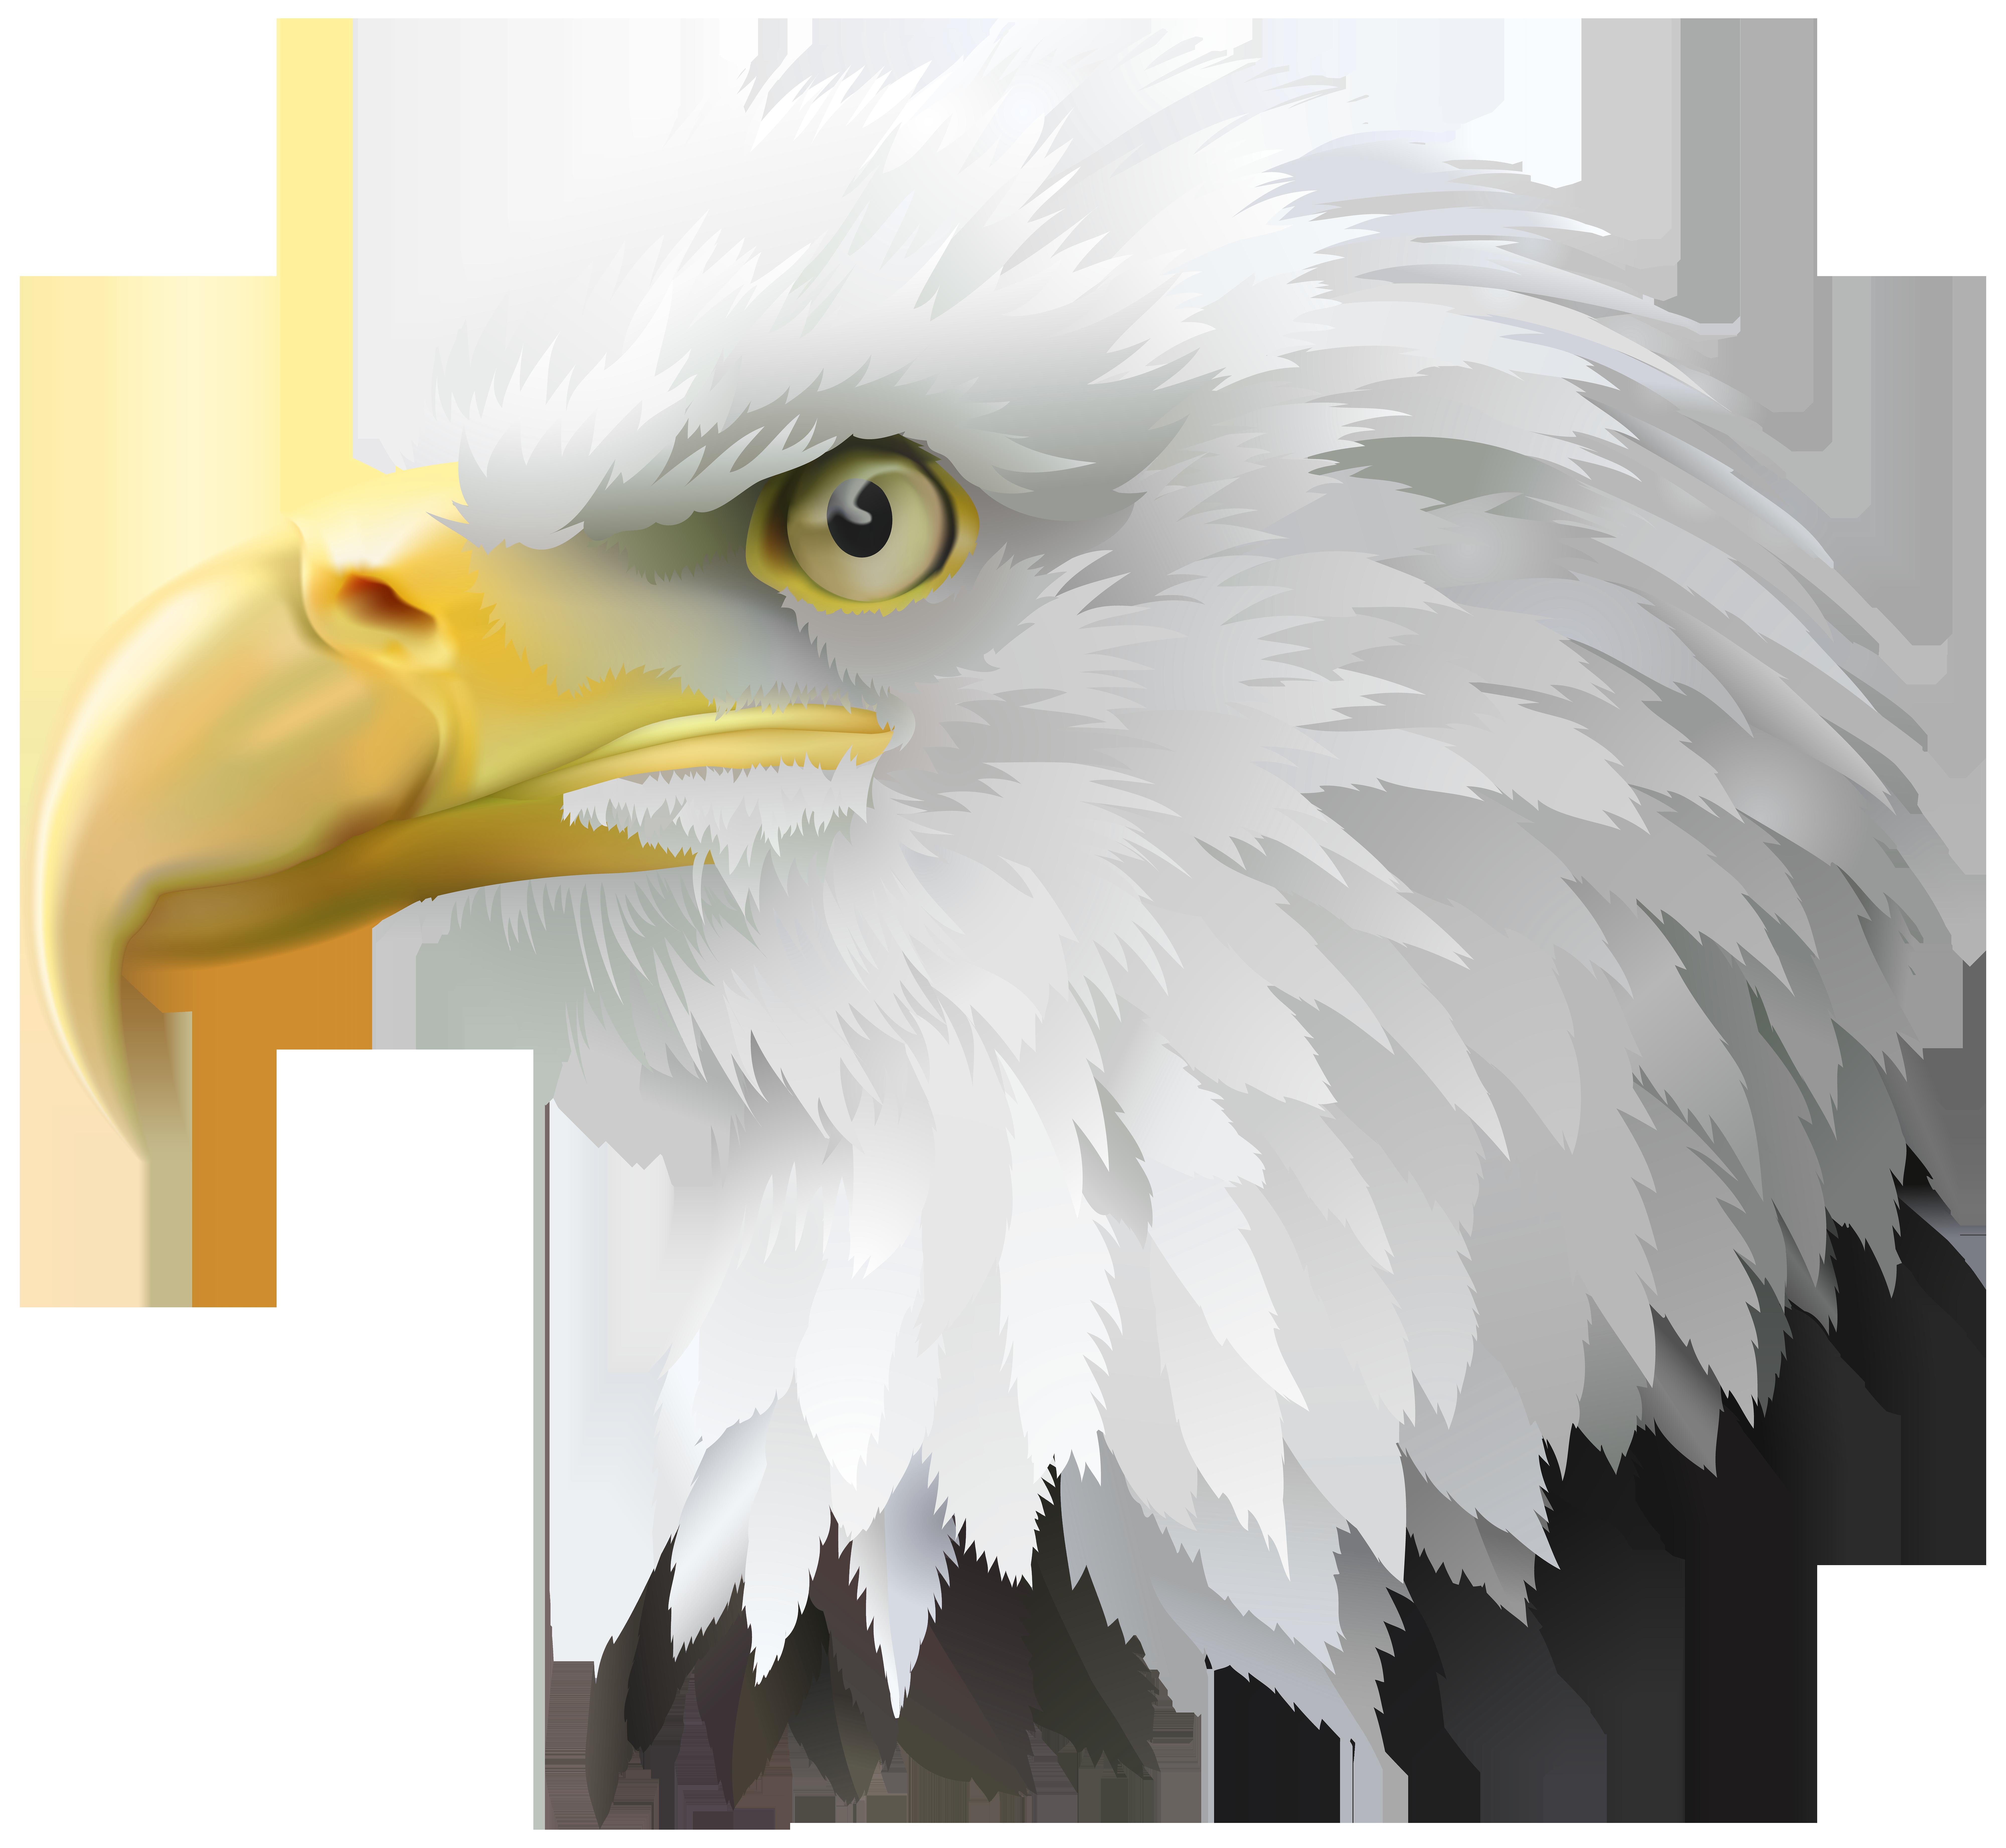 American eagle head clipart clipart freeuse library American Eagle Head Transparent PNG Clip Art Image   Gallery ... clipart freeuse library